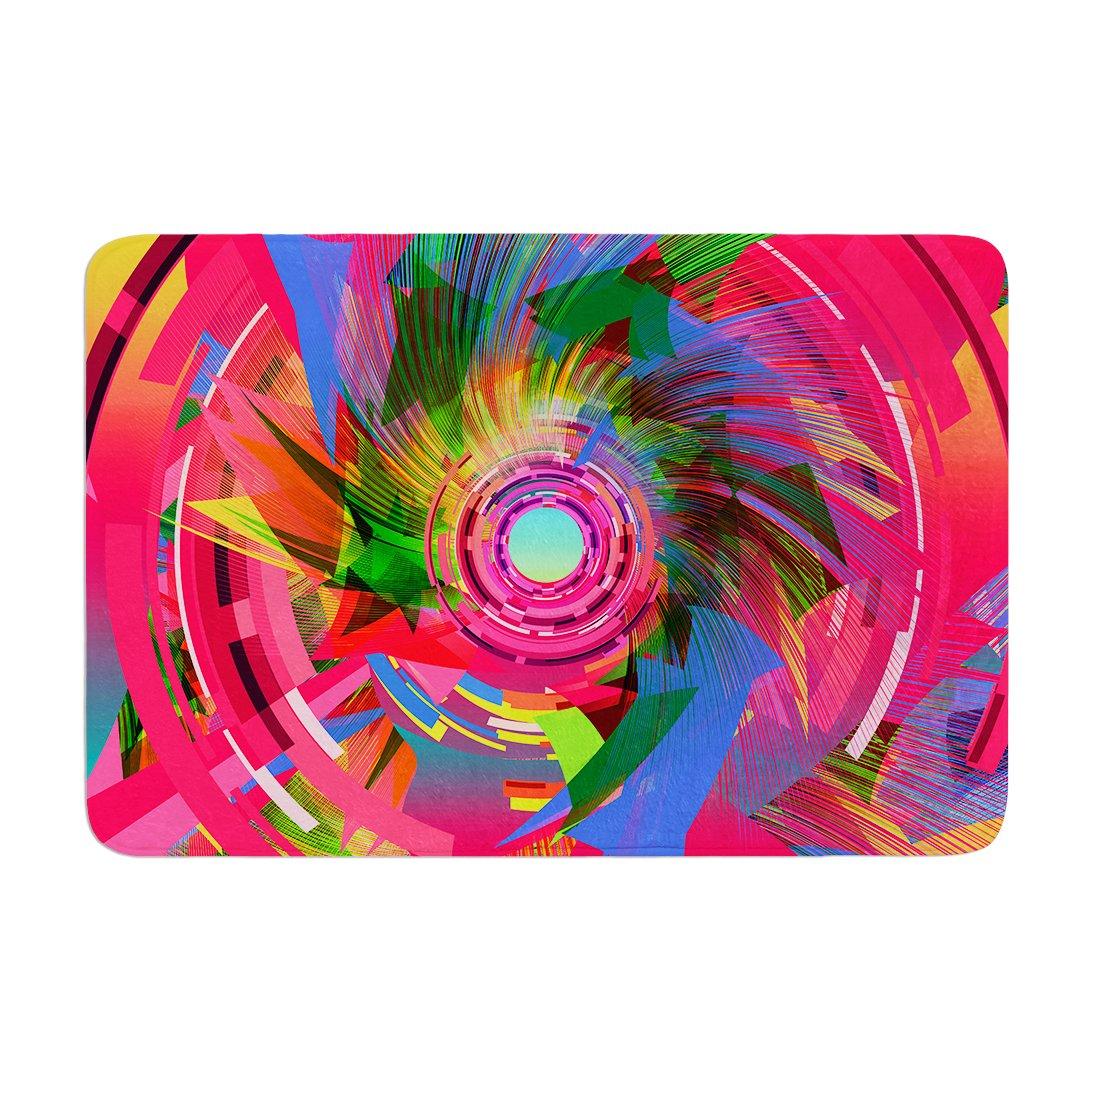 Kess InHouse Danny Ivan Fun Hole Pink Multicolor Memory Foam Bath Mat 17 by 24